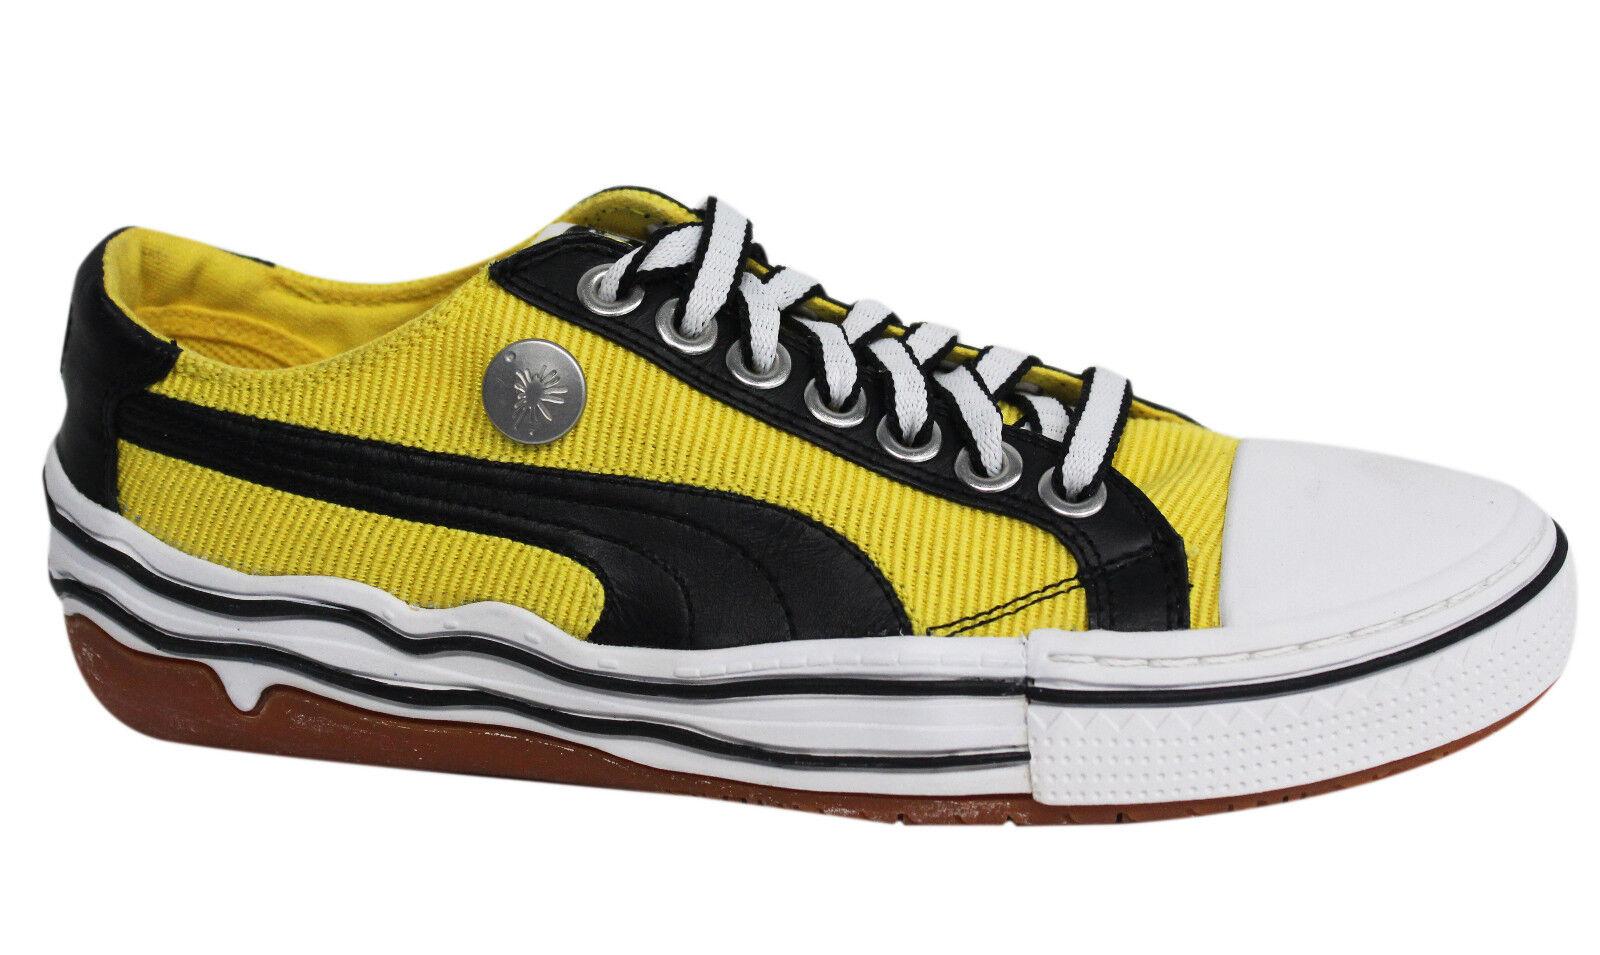 Puma Mihara Yasuhiro My 41 gelb schwarzer Schnürschuh Herren Turnschuhe 347808